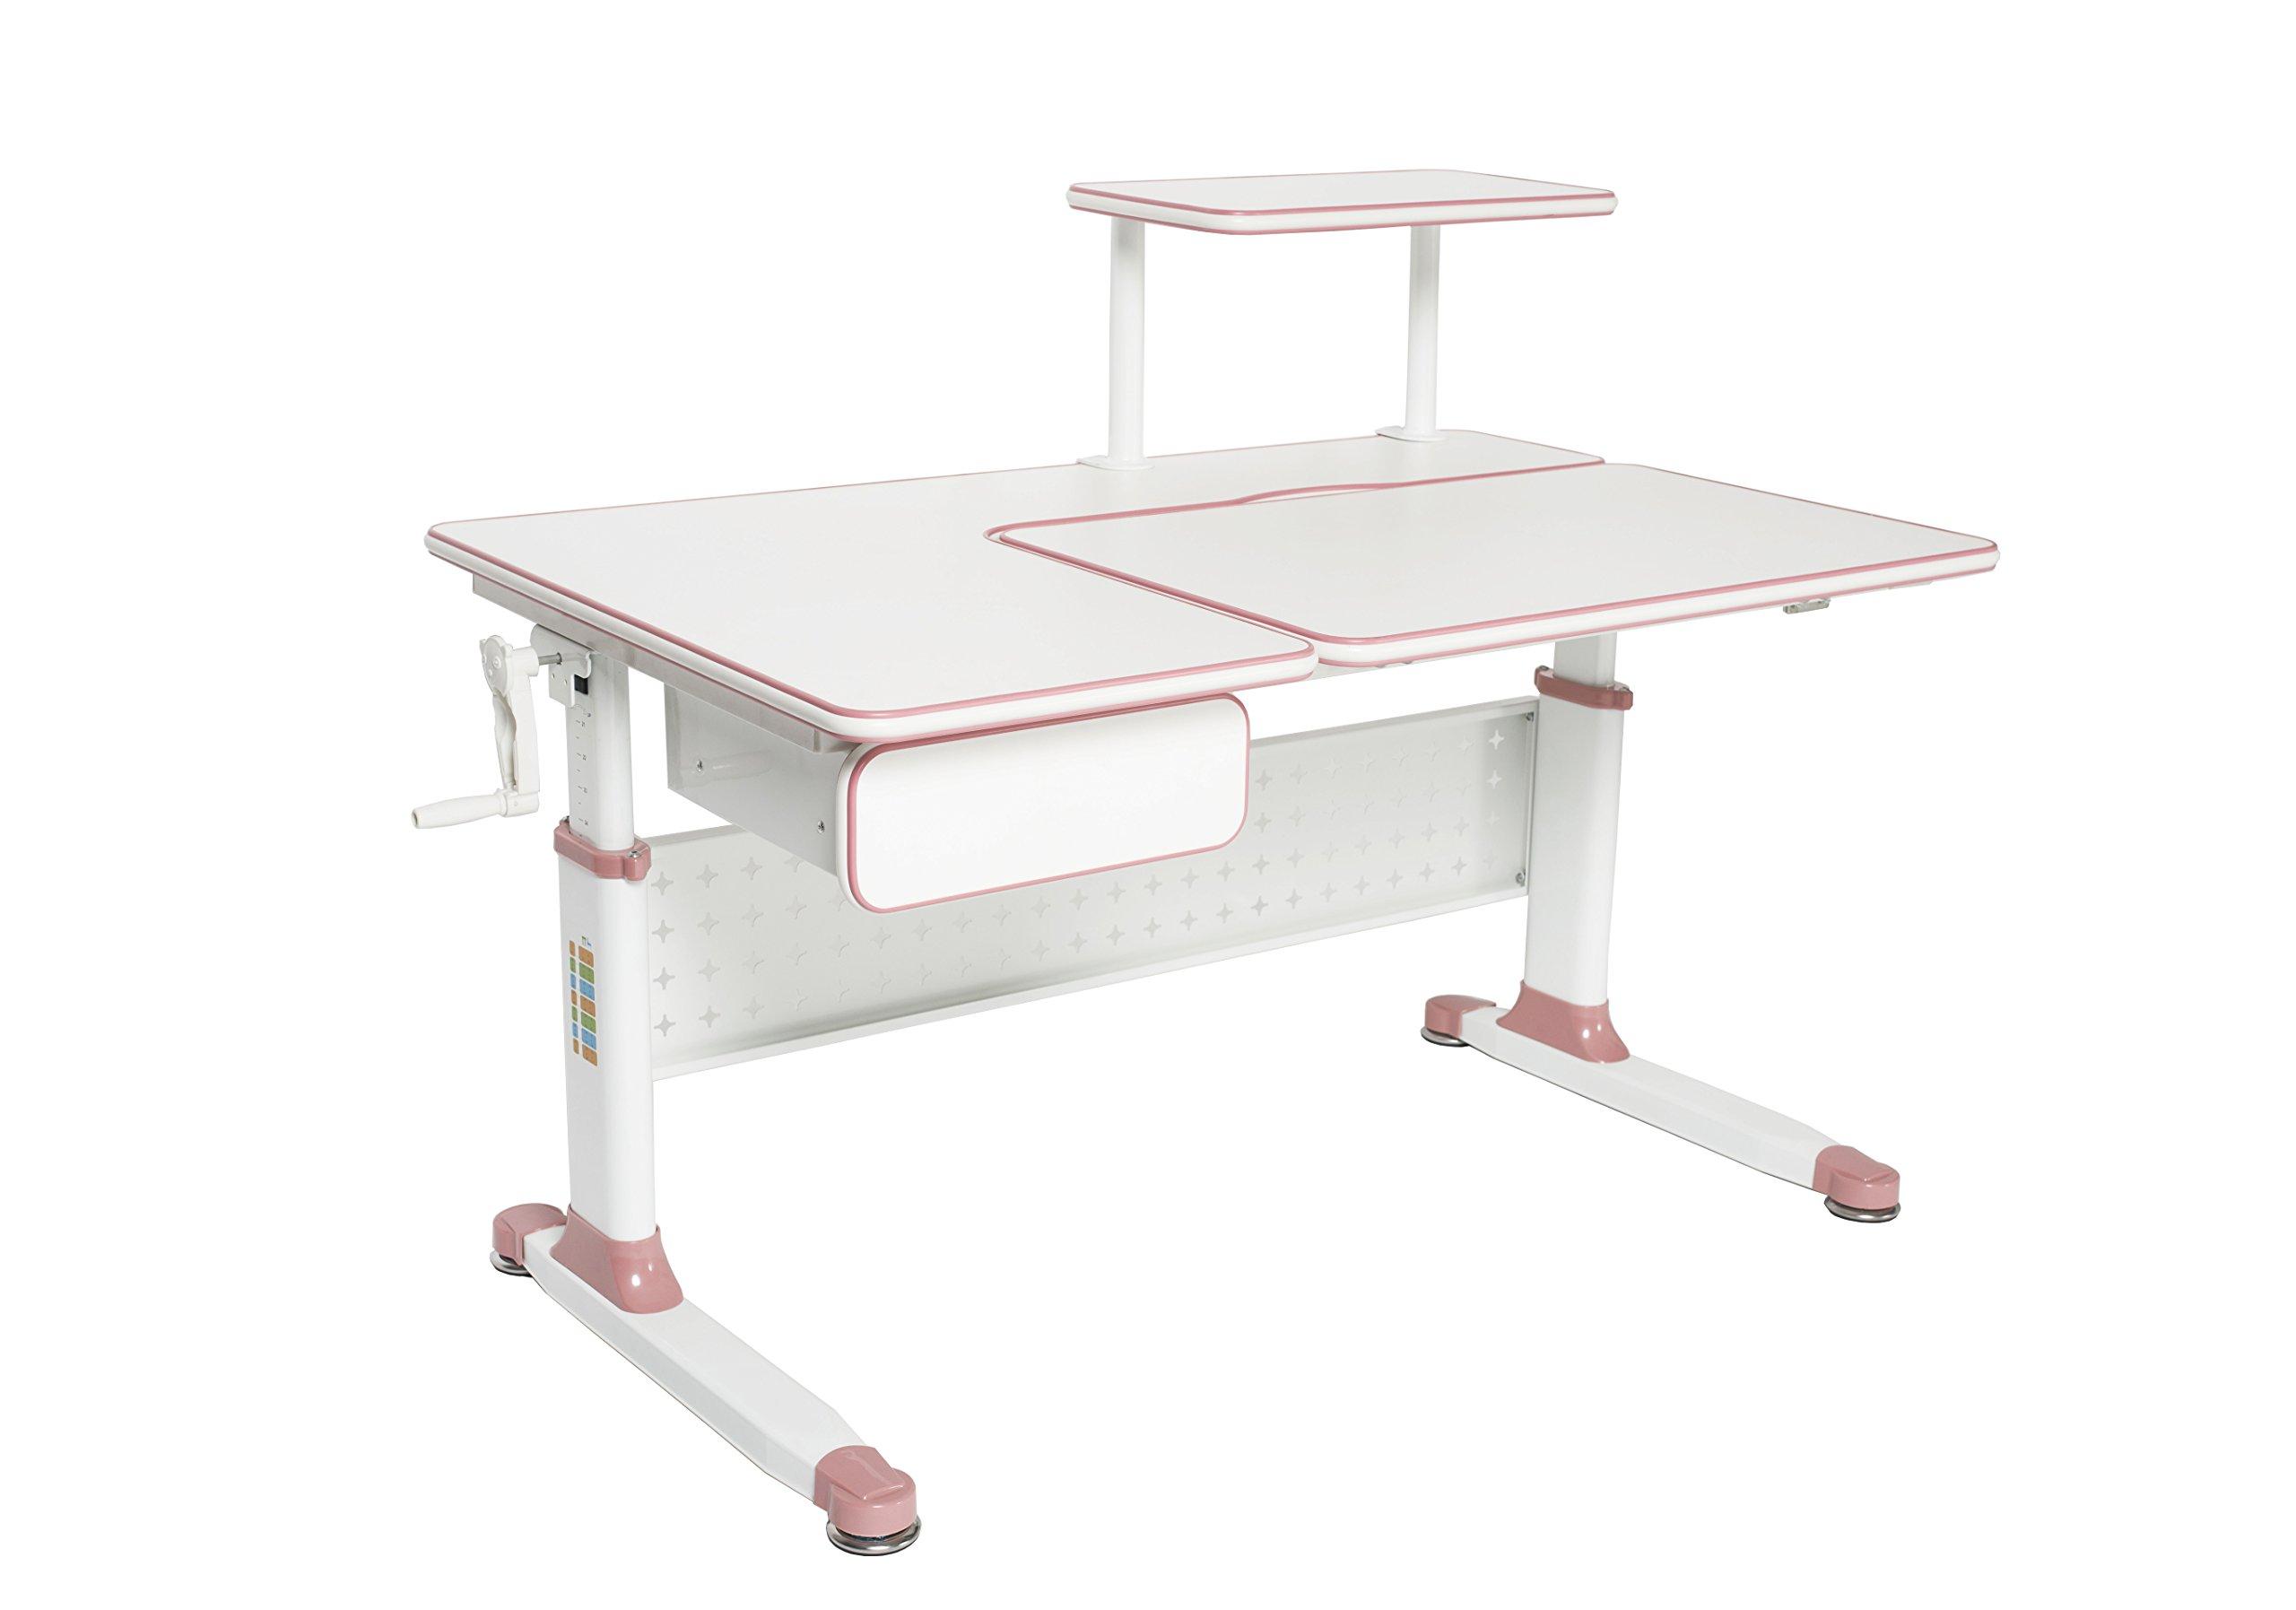 ApexDesk Little Soleil DX 43''W Children's Height Adjustable Study Desk w/ Integrated Shelf & Drawer (Pink Desk Only)